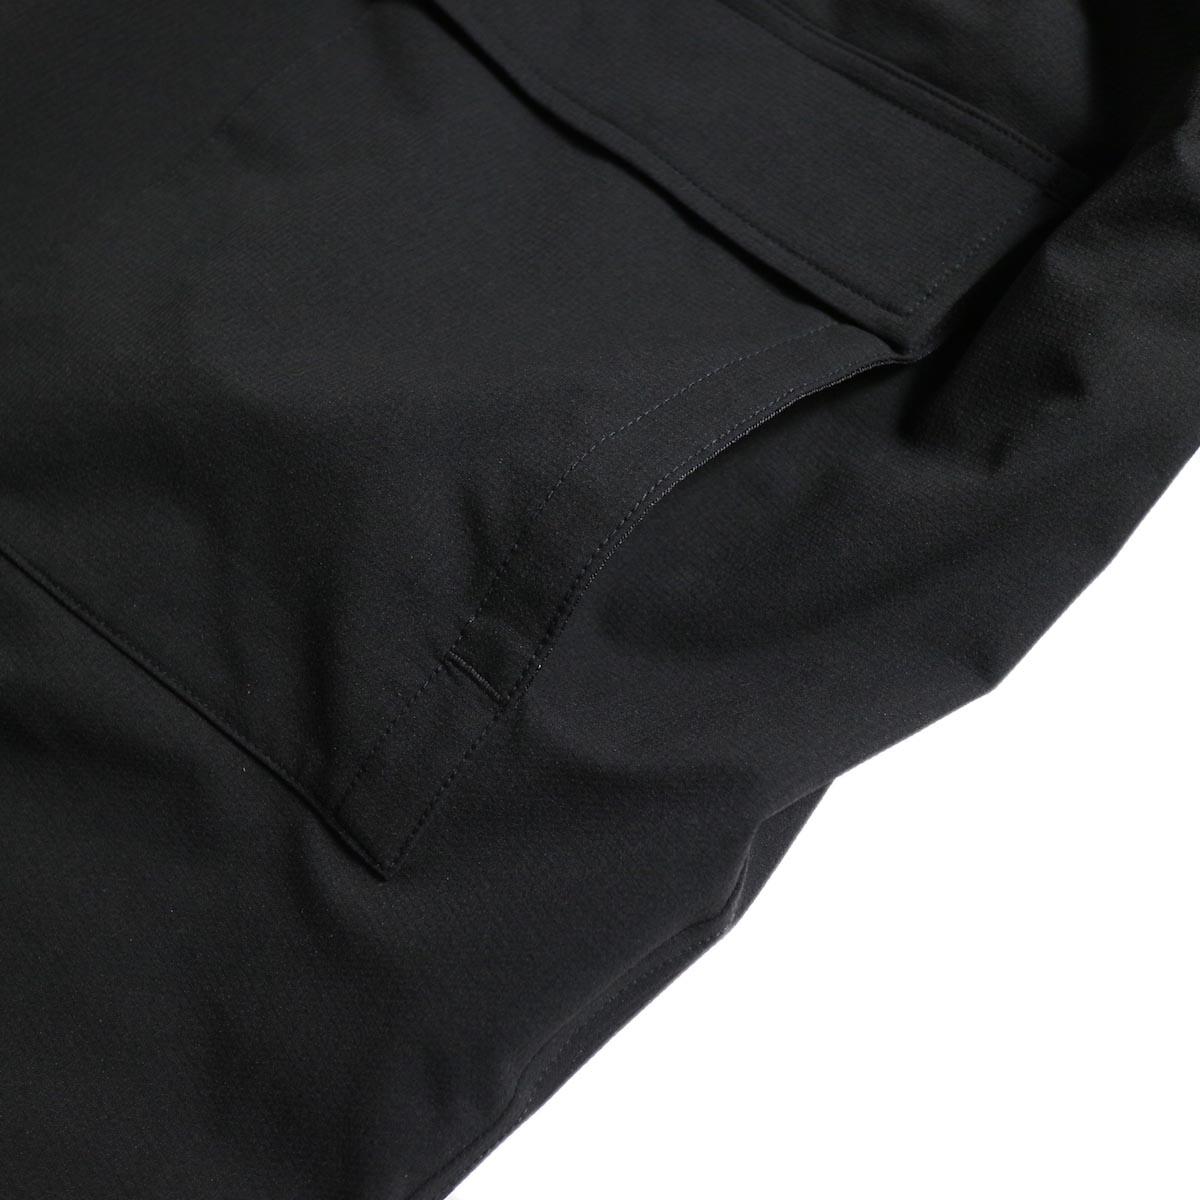 DAIWA PIER39 / Pull Over Snow Parka (Black)ポケット